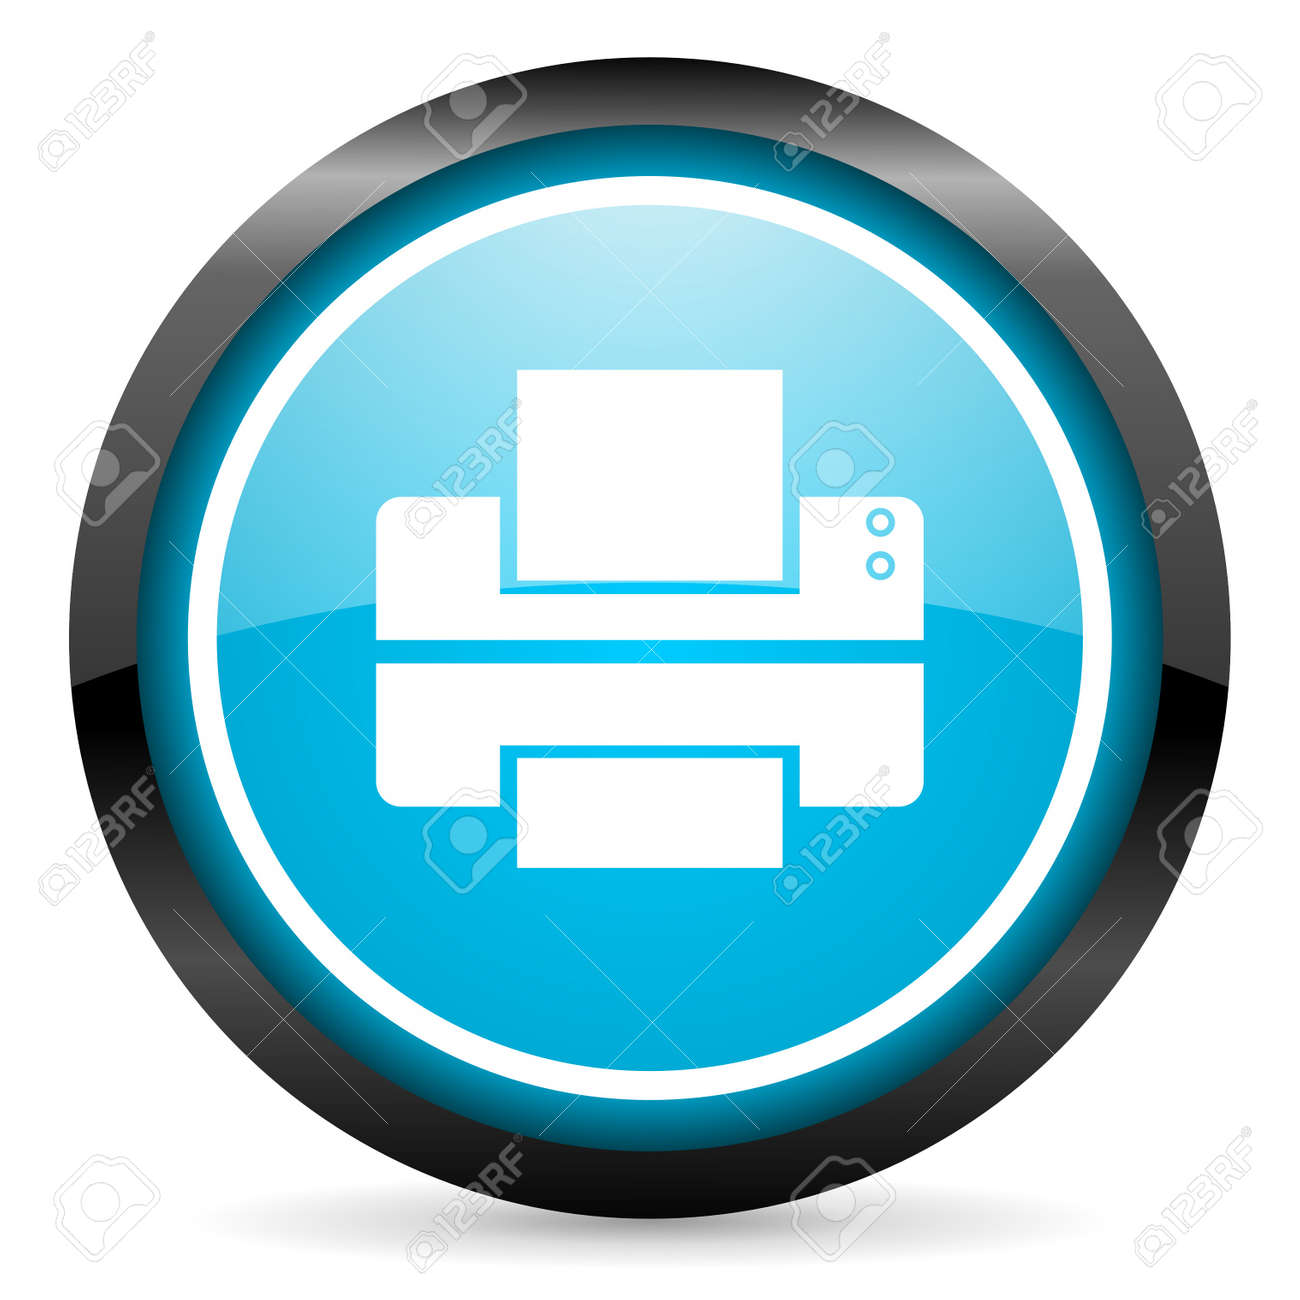 printer blue glossy circle icon on white background Stock Photo - 16674680